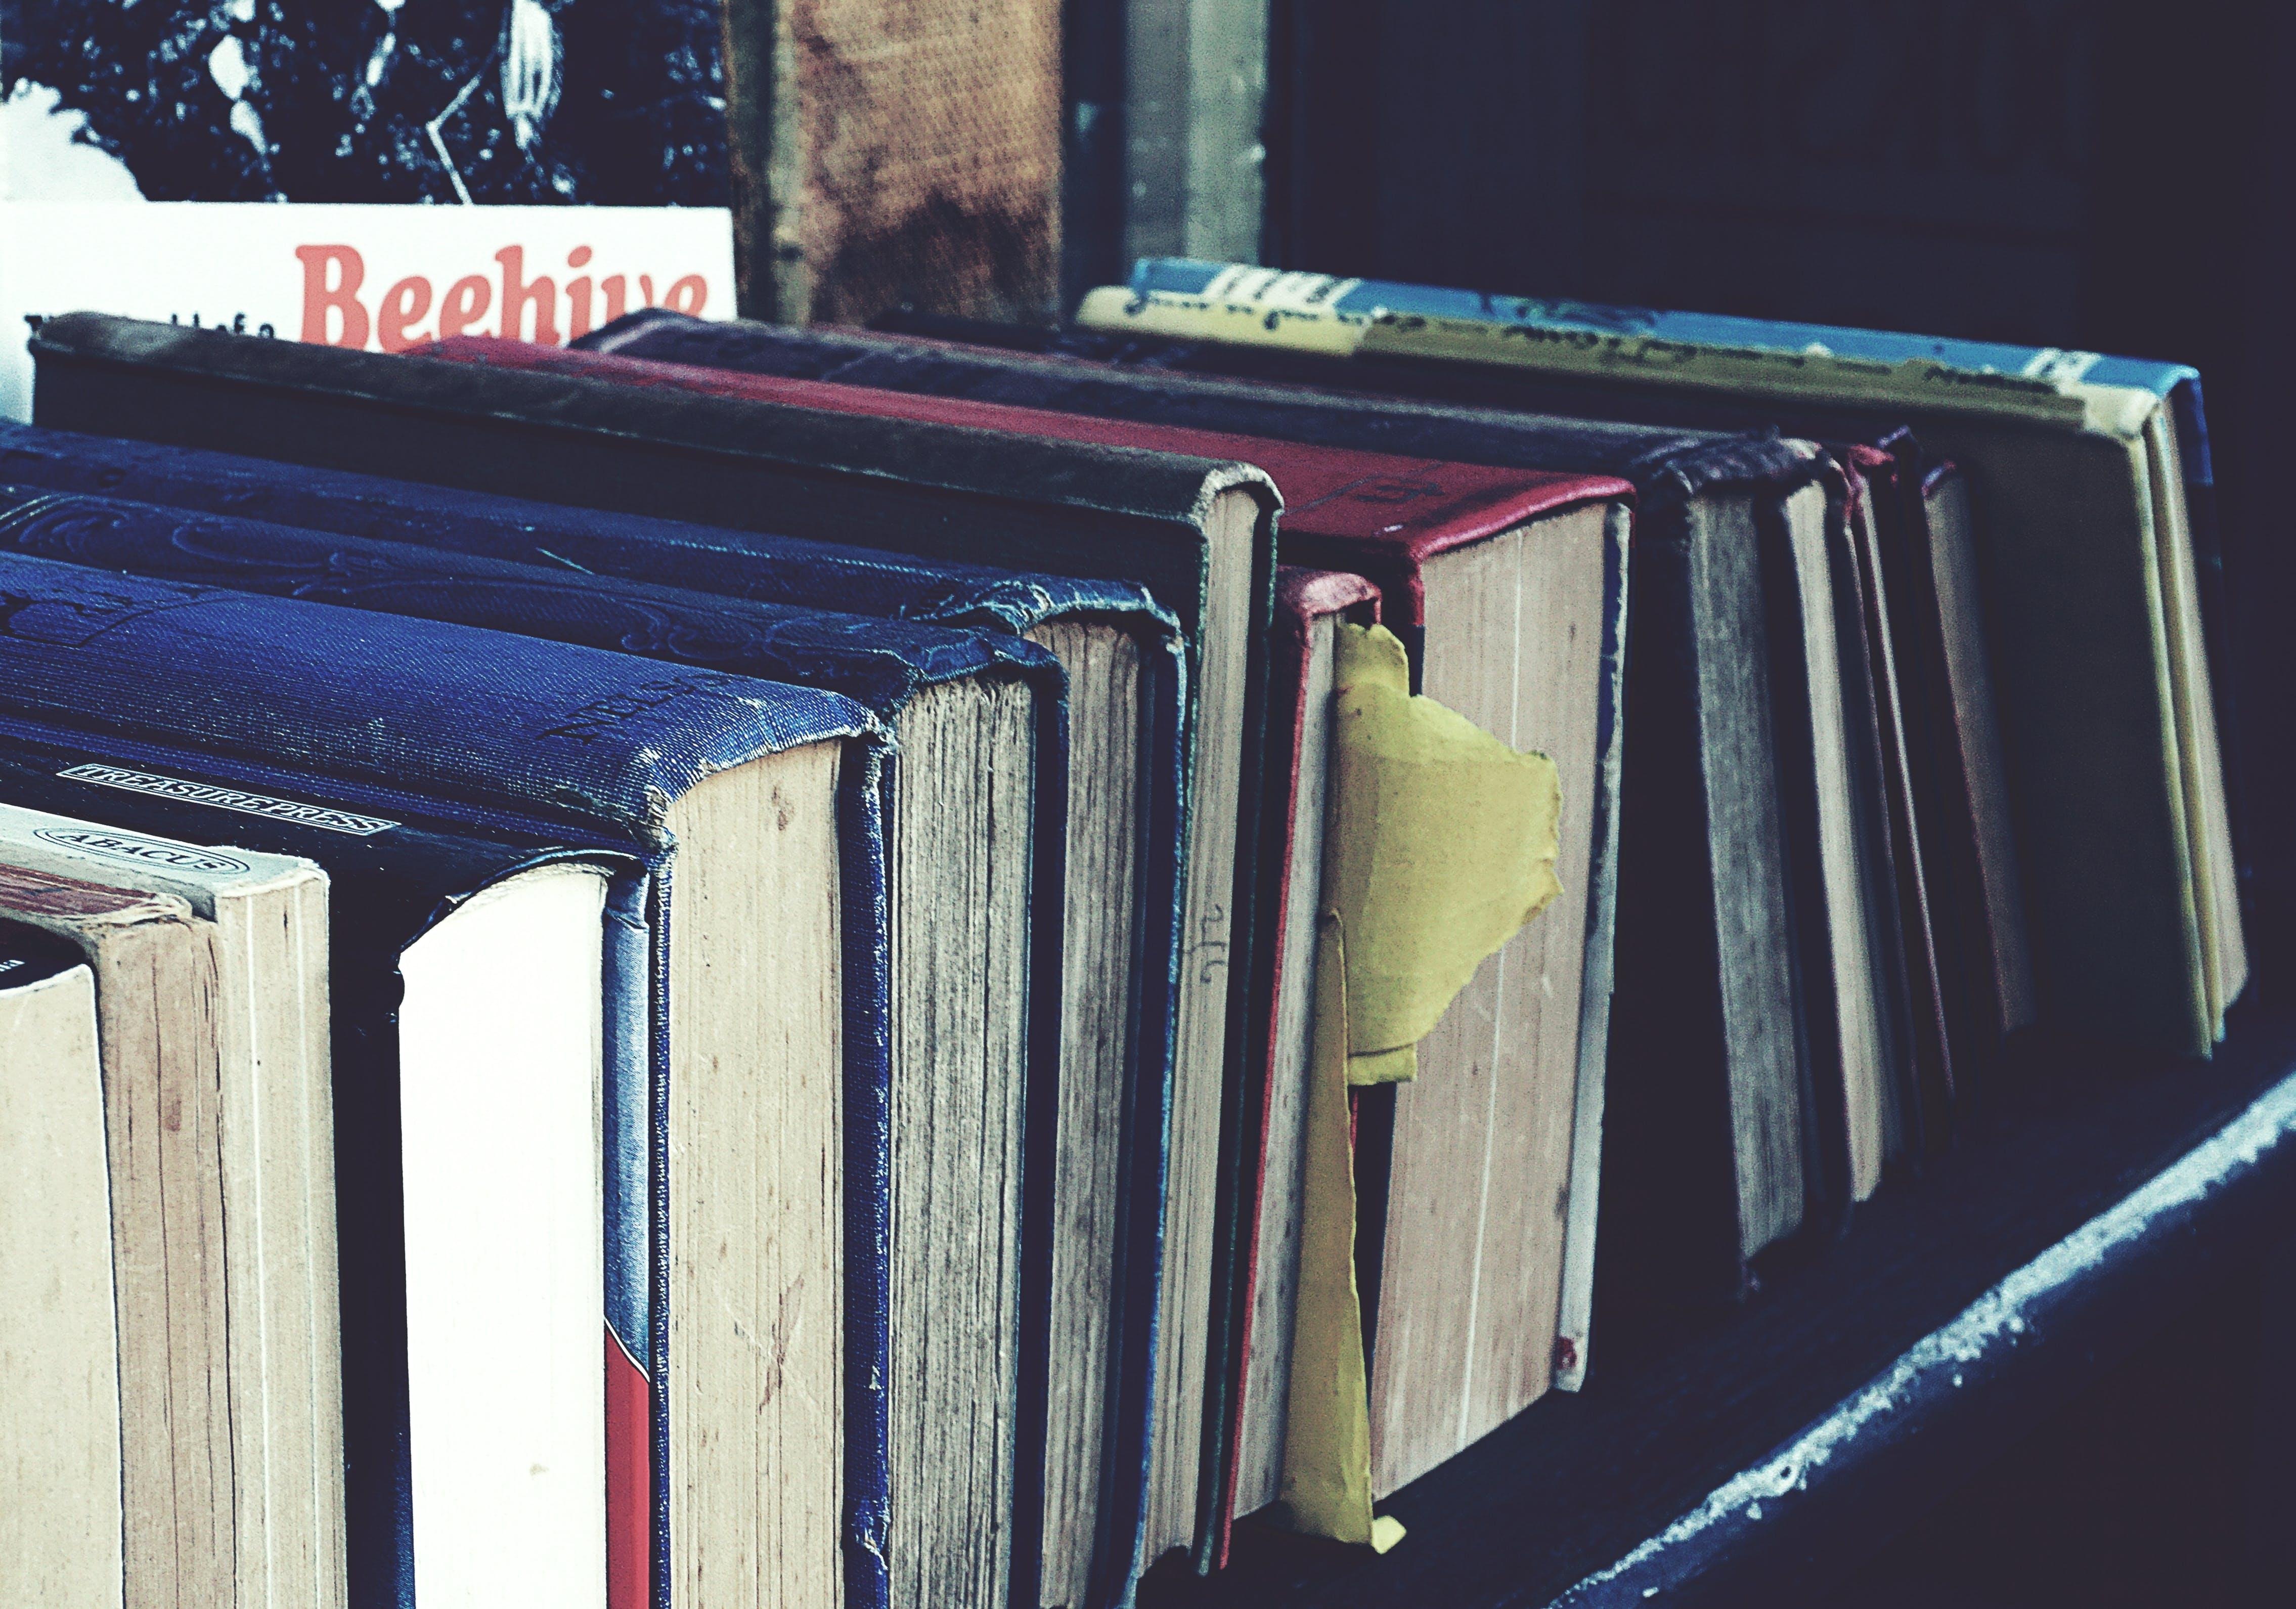 Free stock photo of book stack, books, bookshop, bookstore